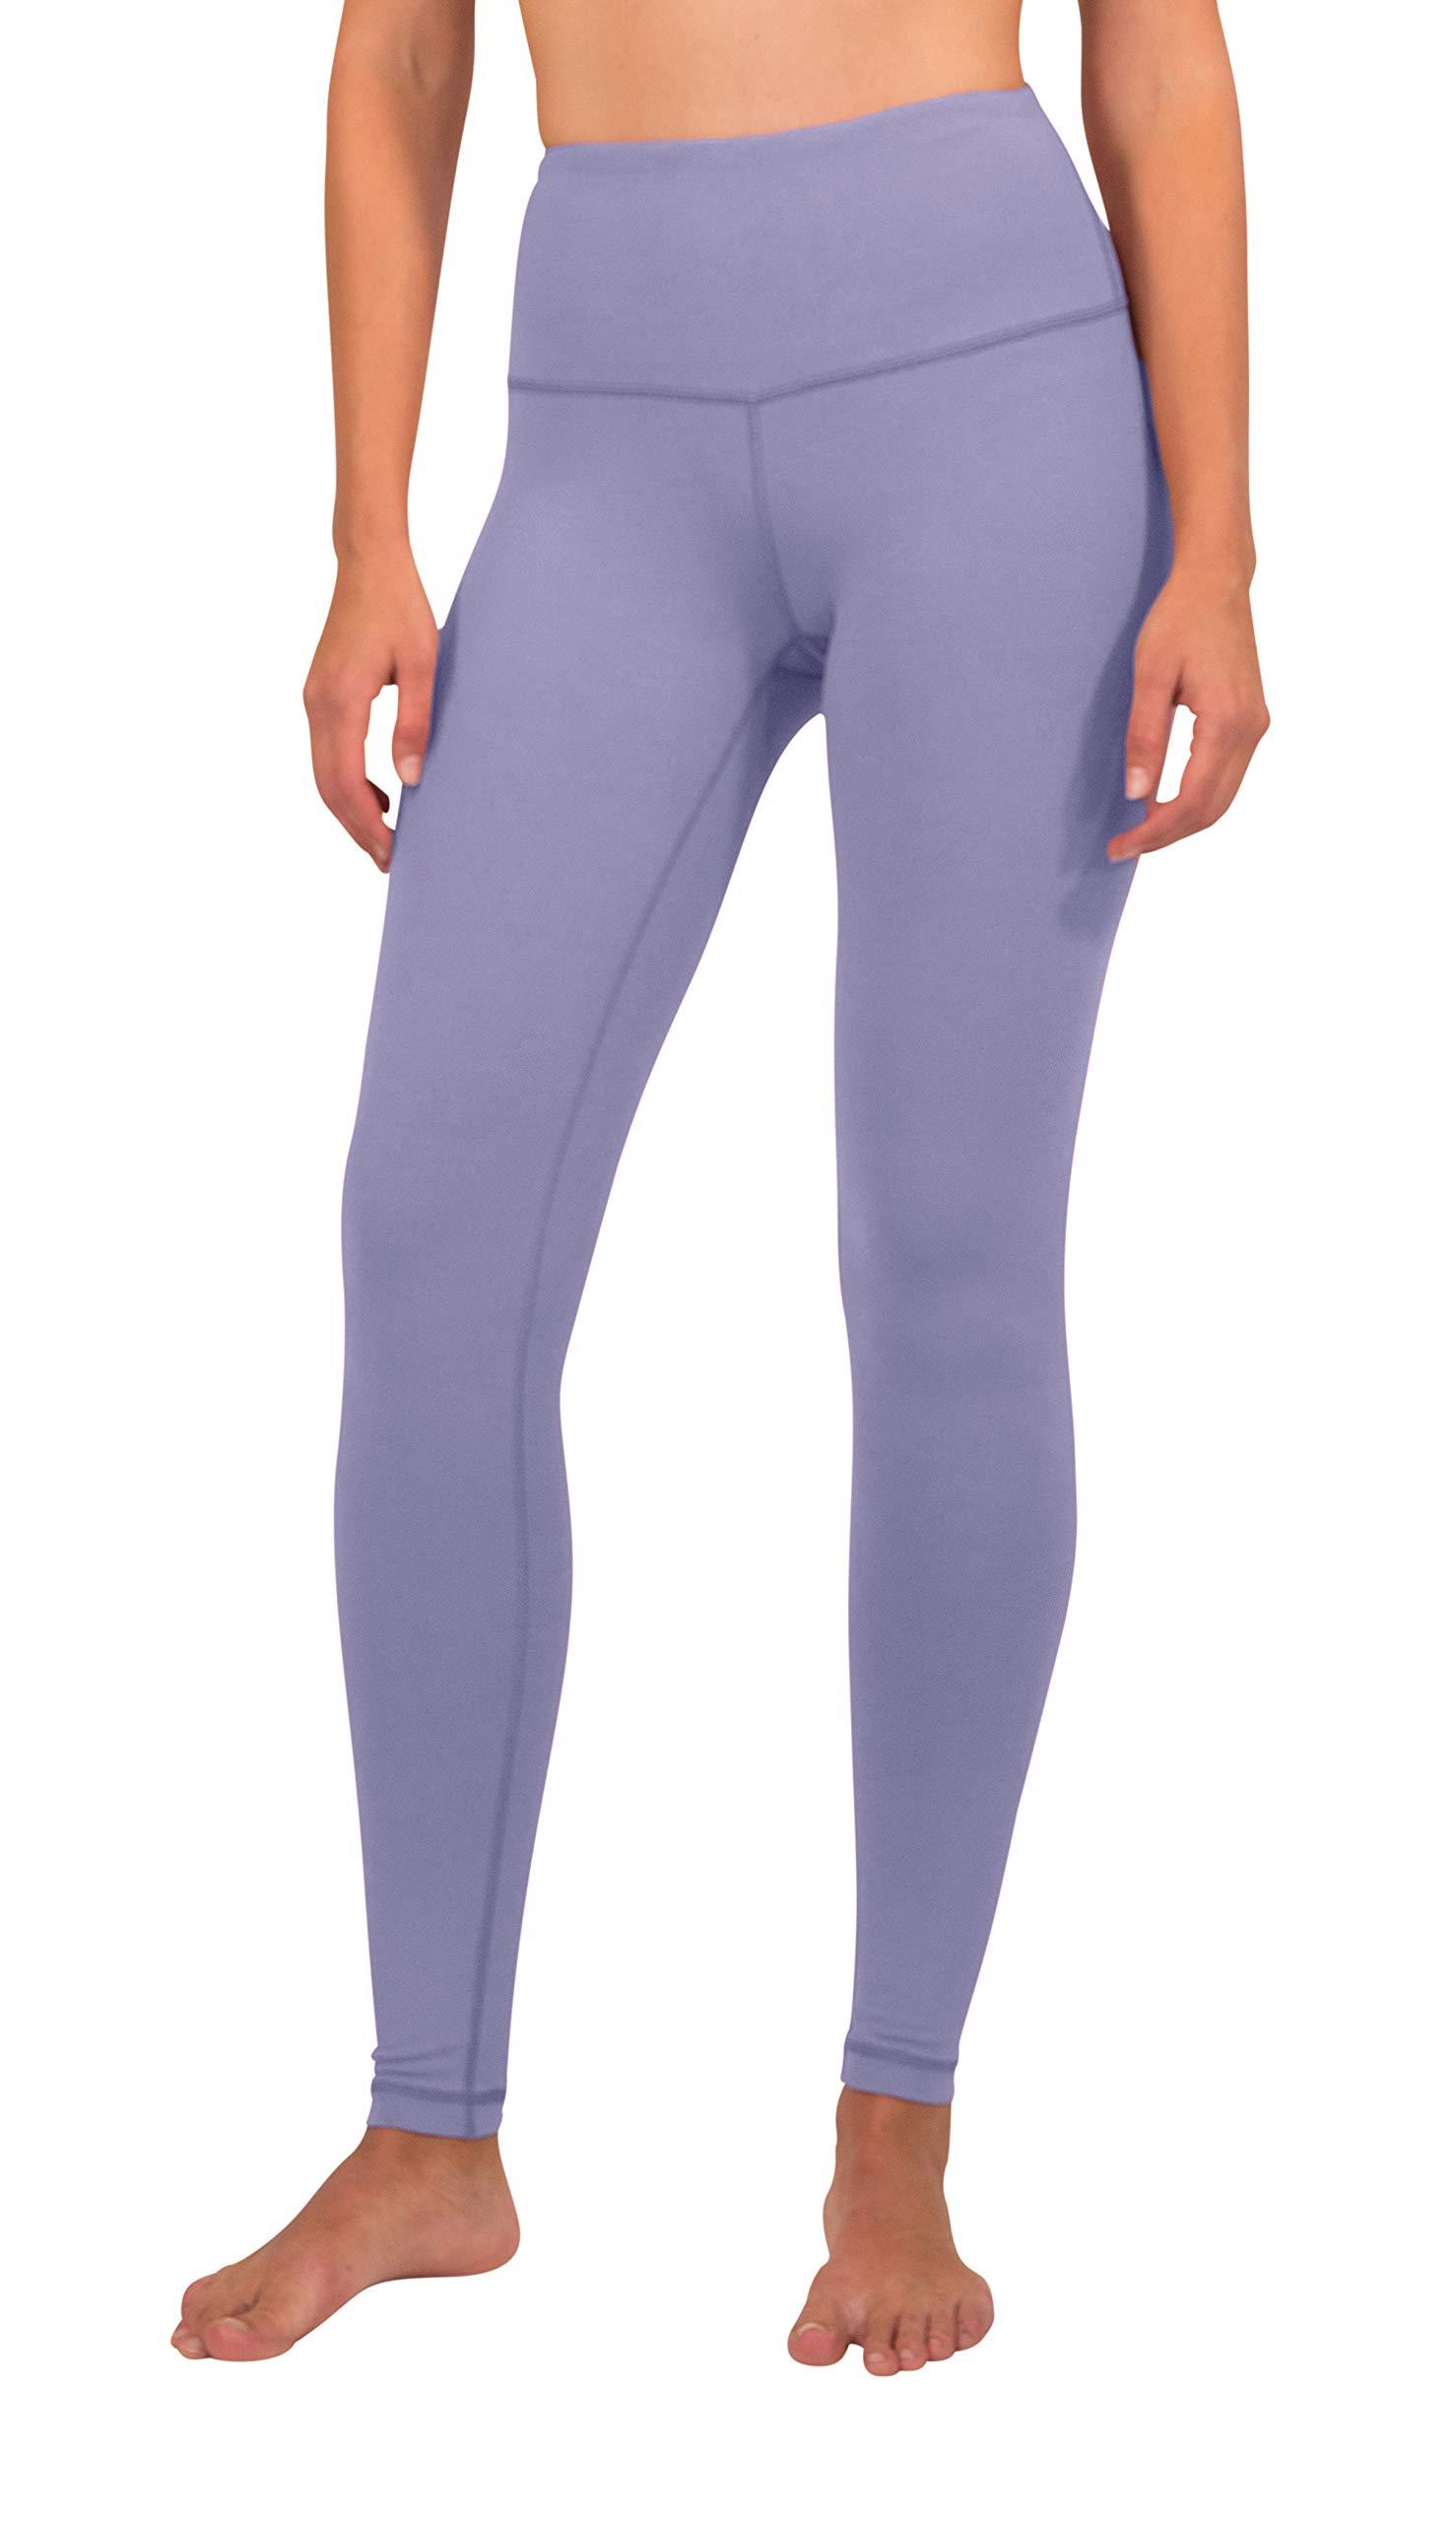 Yogalicious High Waist Ultra Soft Lightweight Leggings - High Rise Yoga Pants- Lilac Mist - XL by Yogalicious